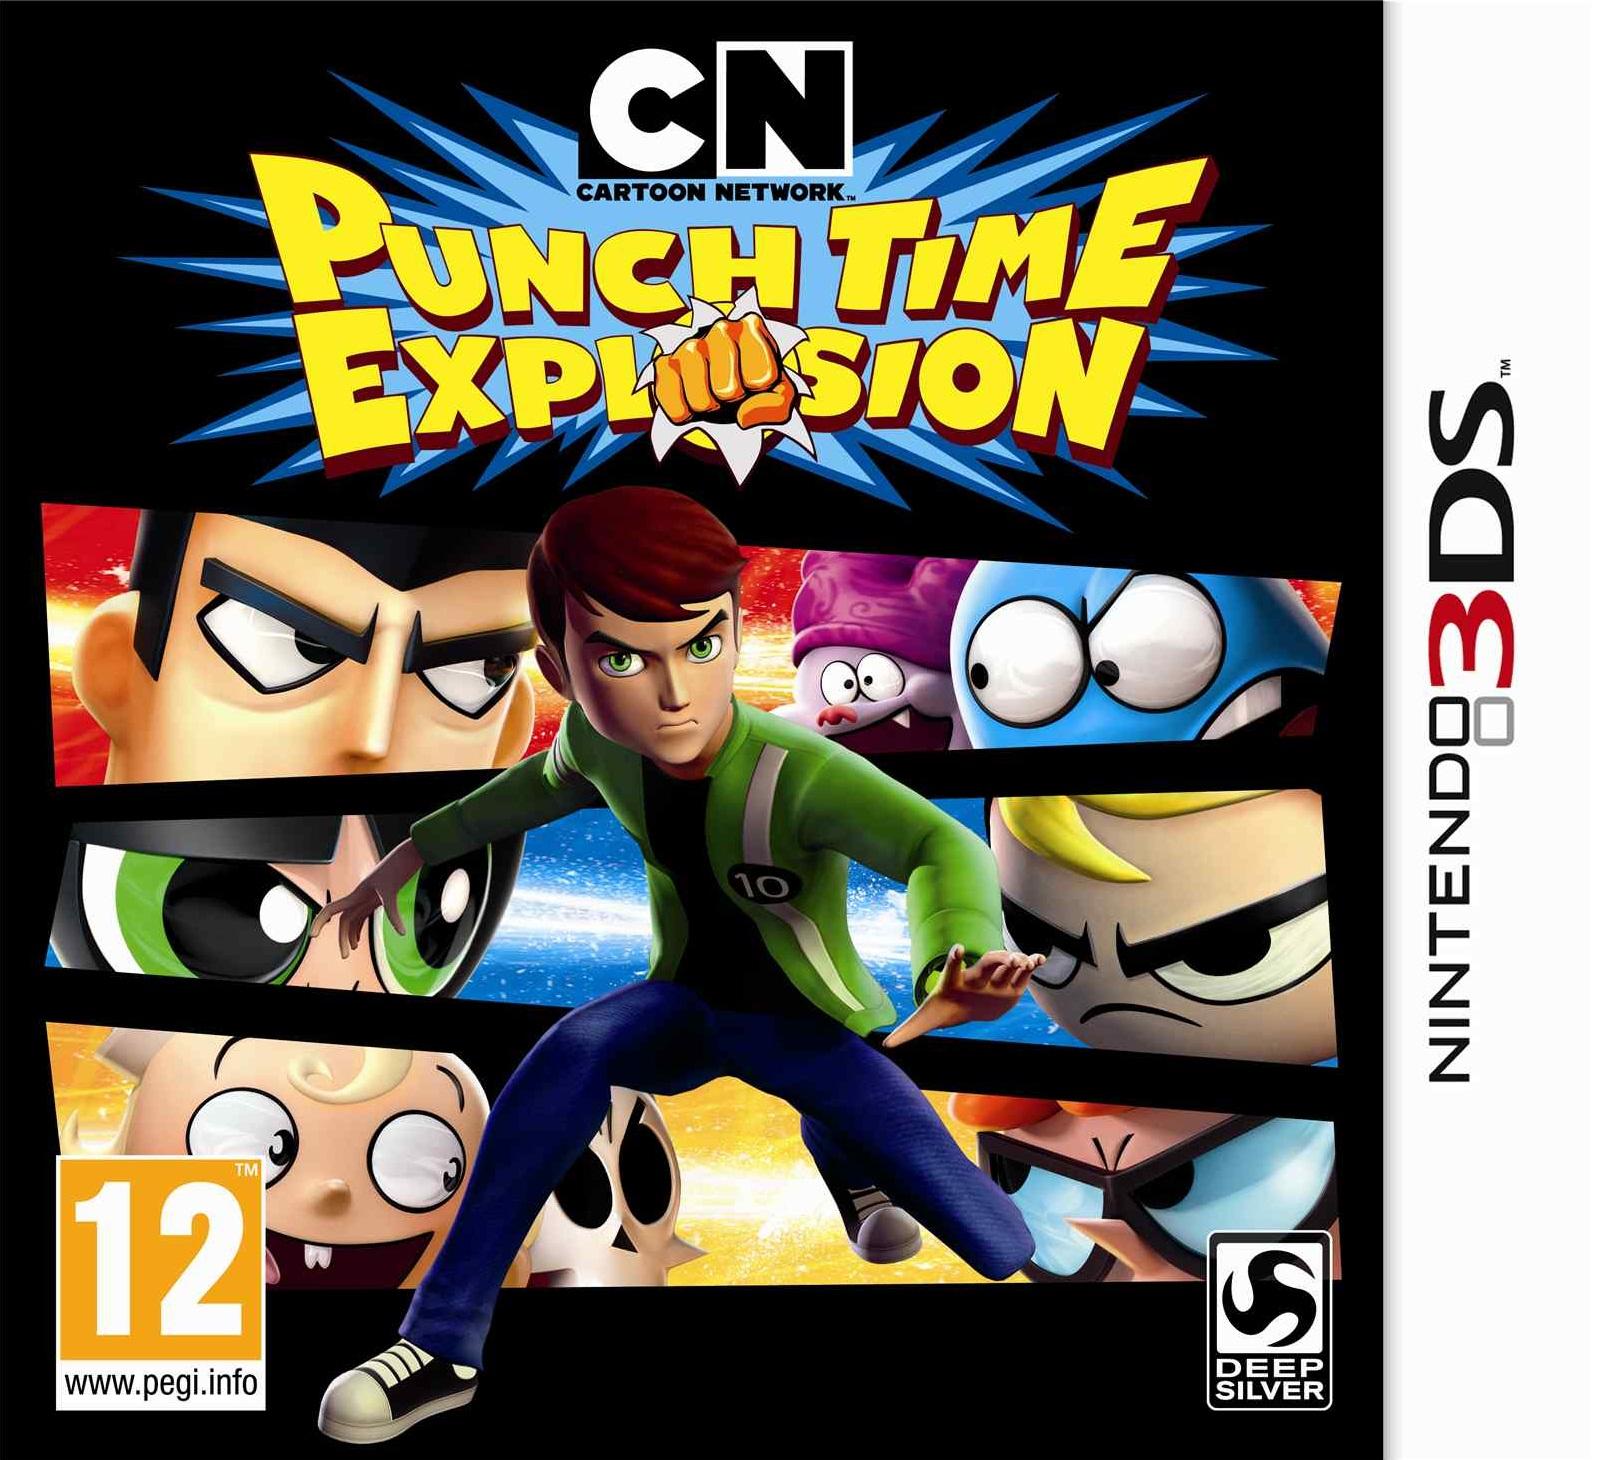 Cn Cartoon Network Punch Time Explosion Nintendo